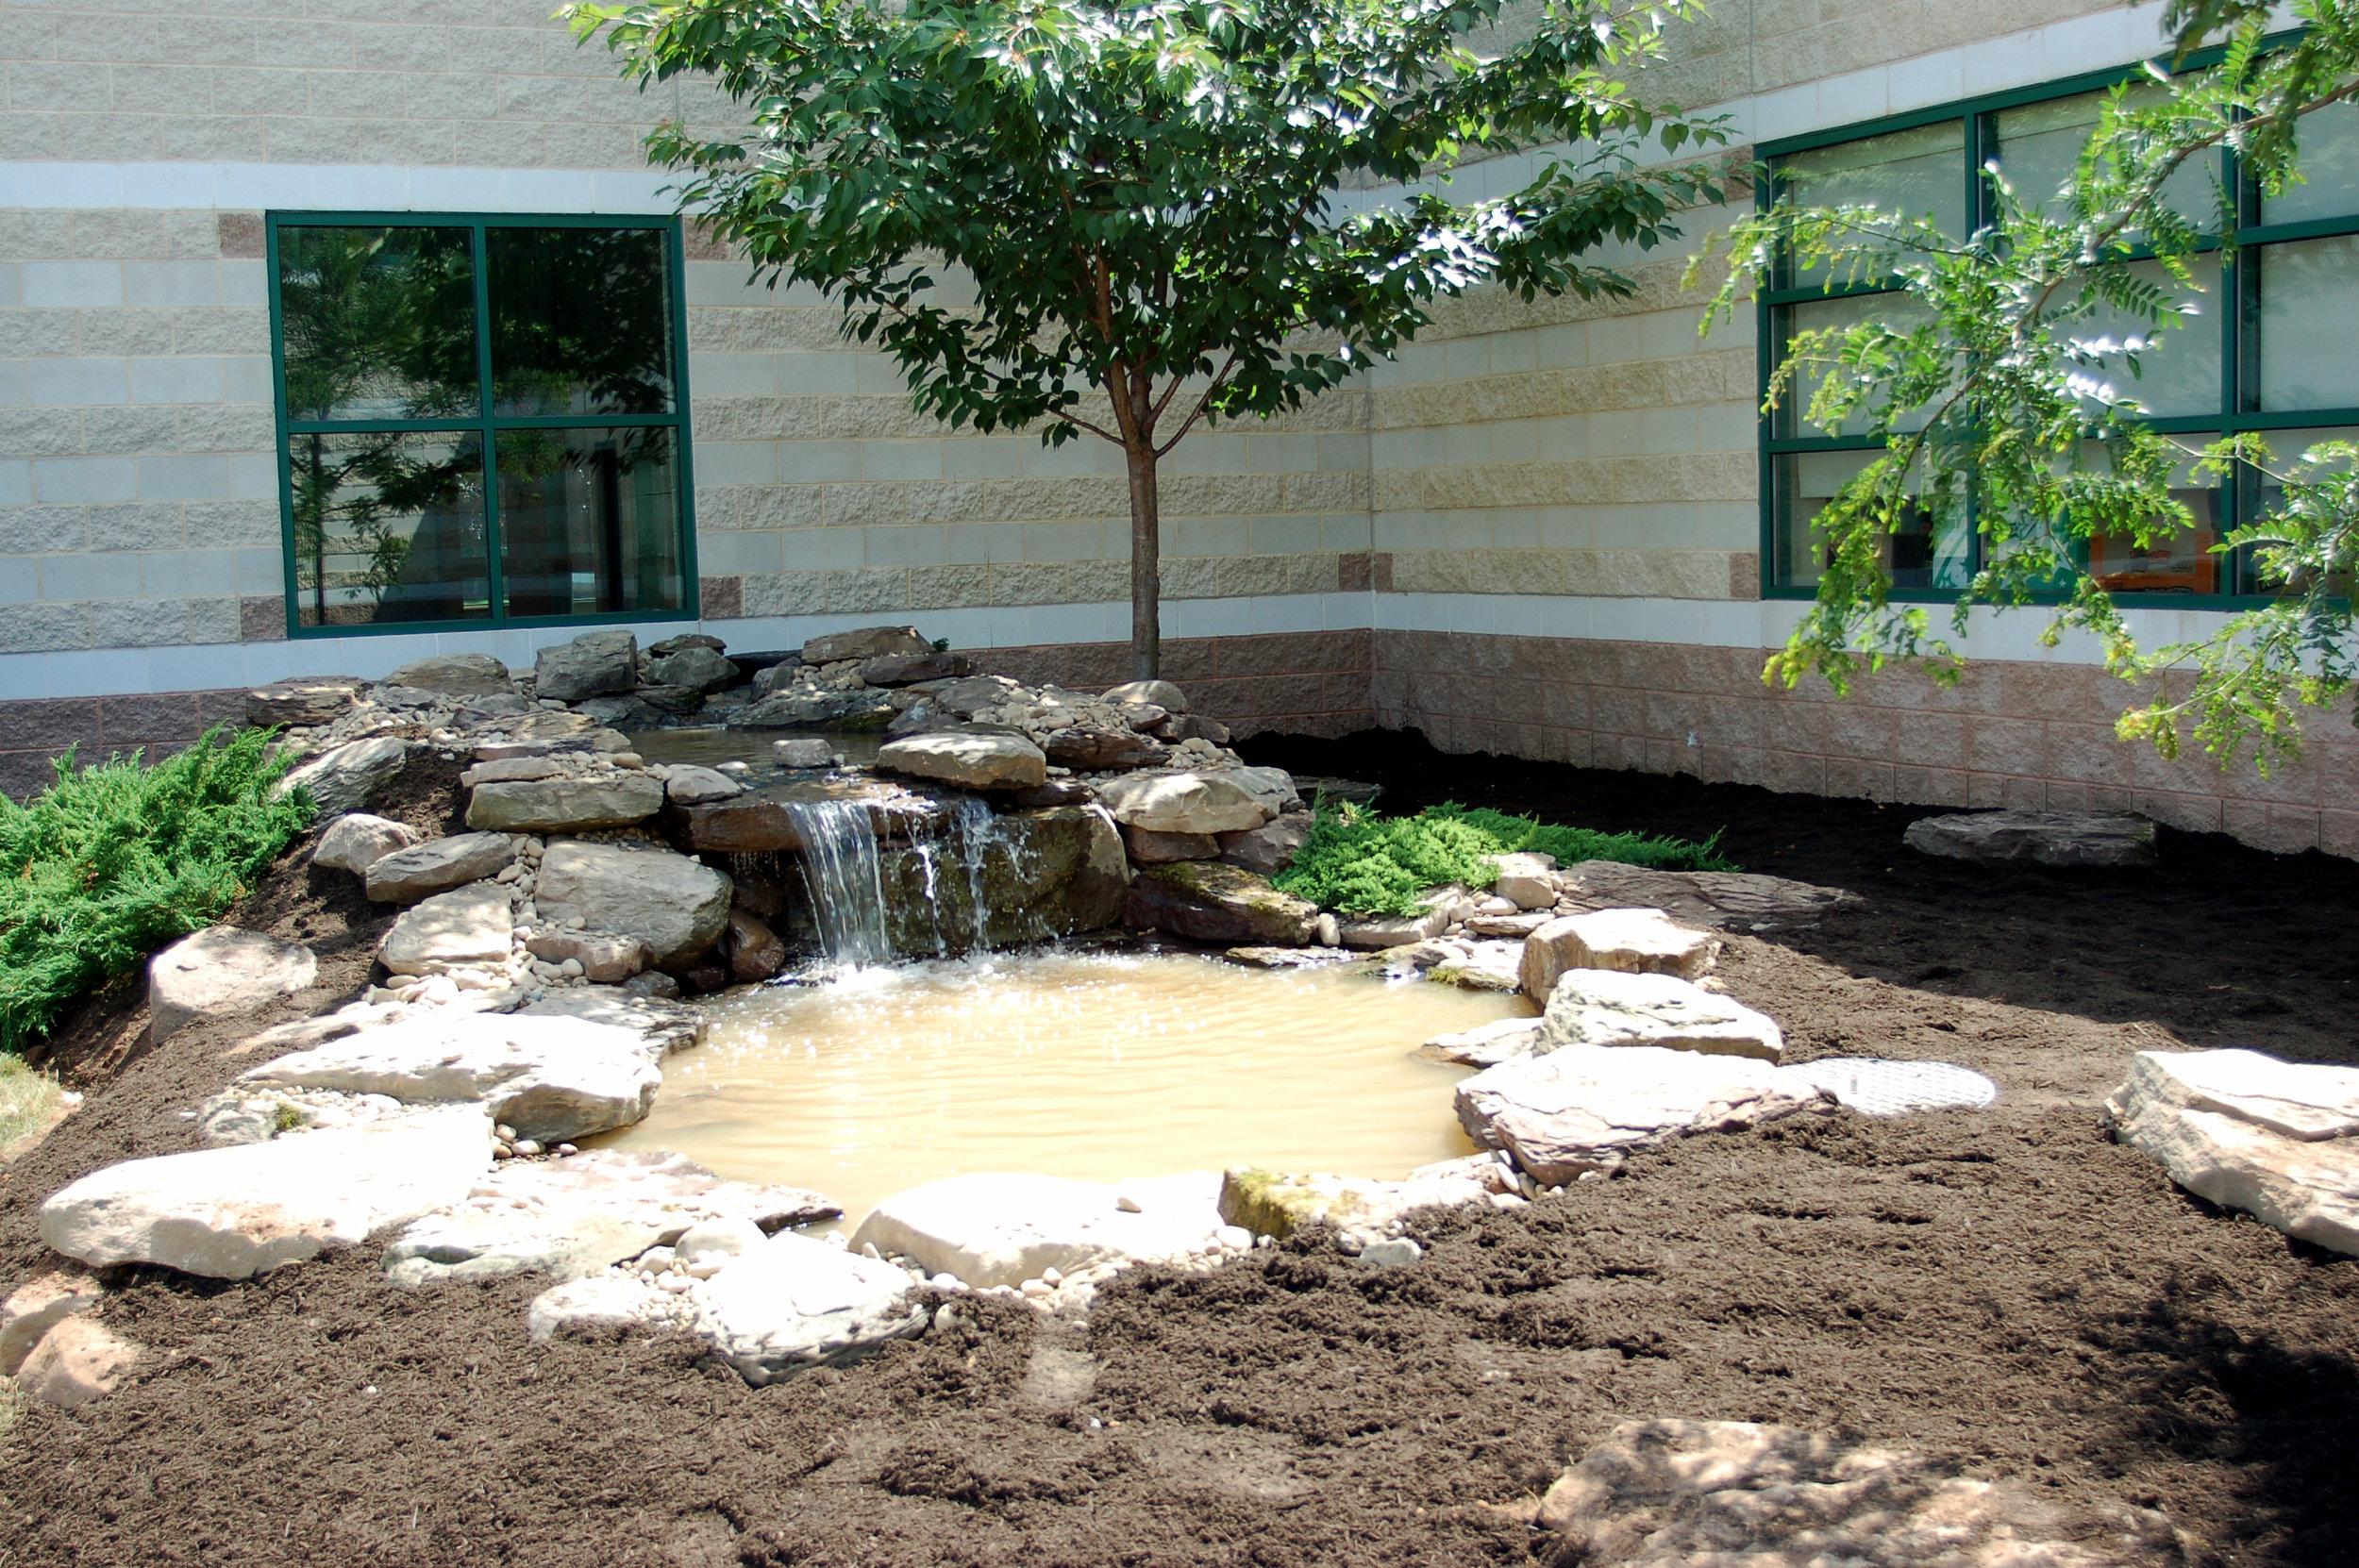 Pondworks_community_Design build_project_custom_Pond_PennView Christian School_04.JPG